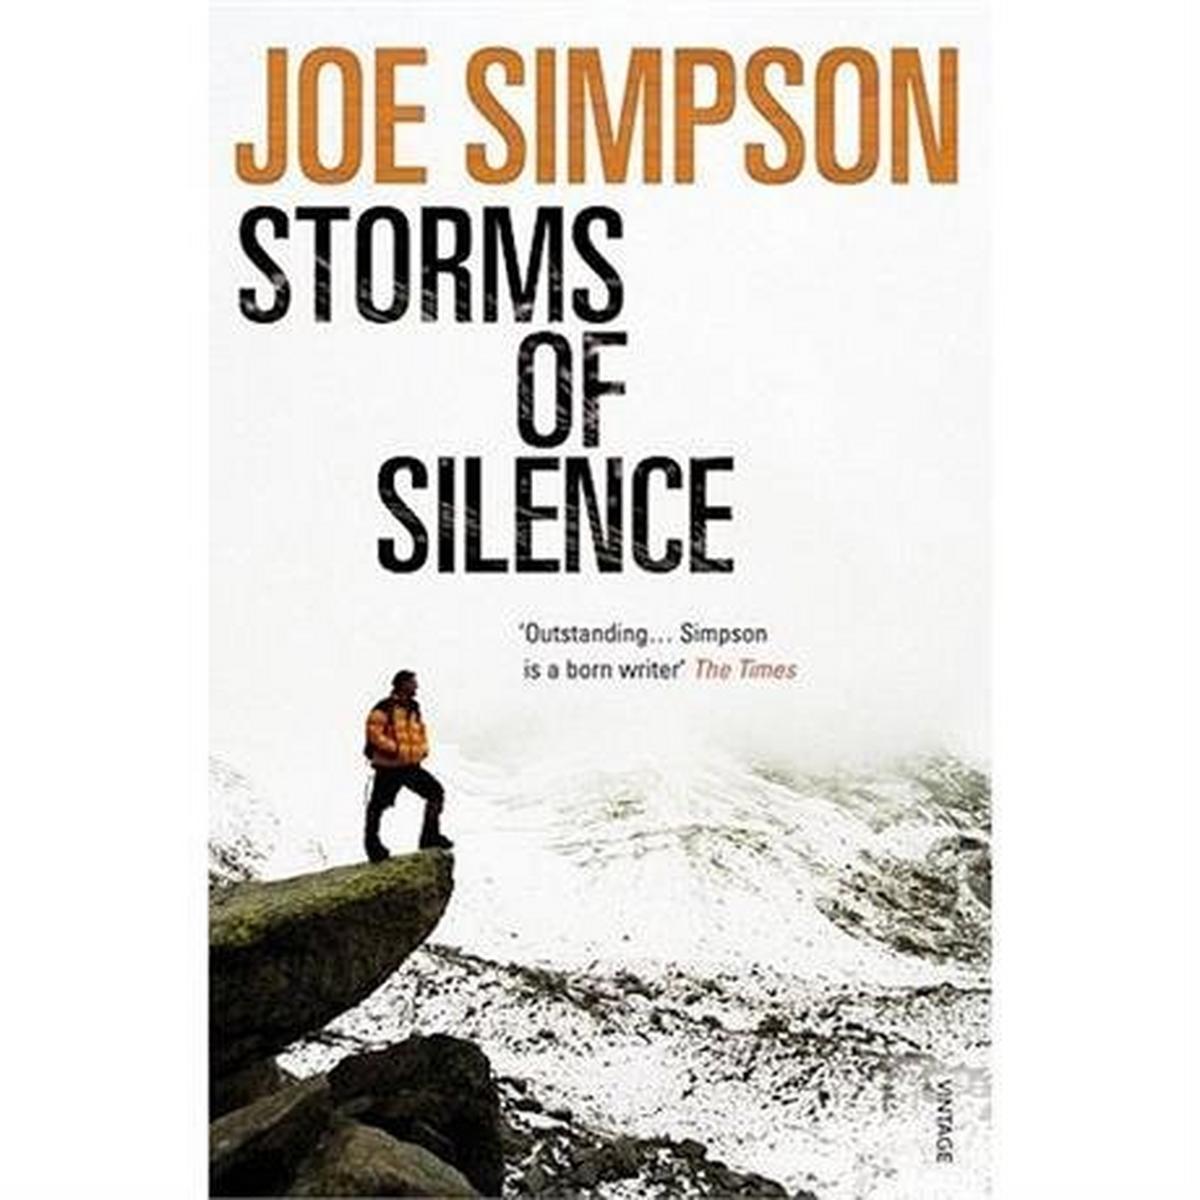 Miscellaneous Book: Storms of Silence - Joe Simpson